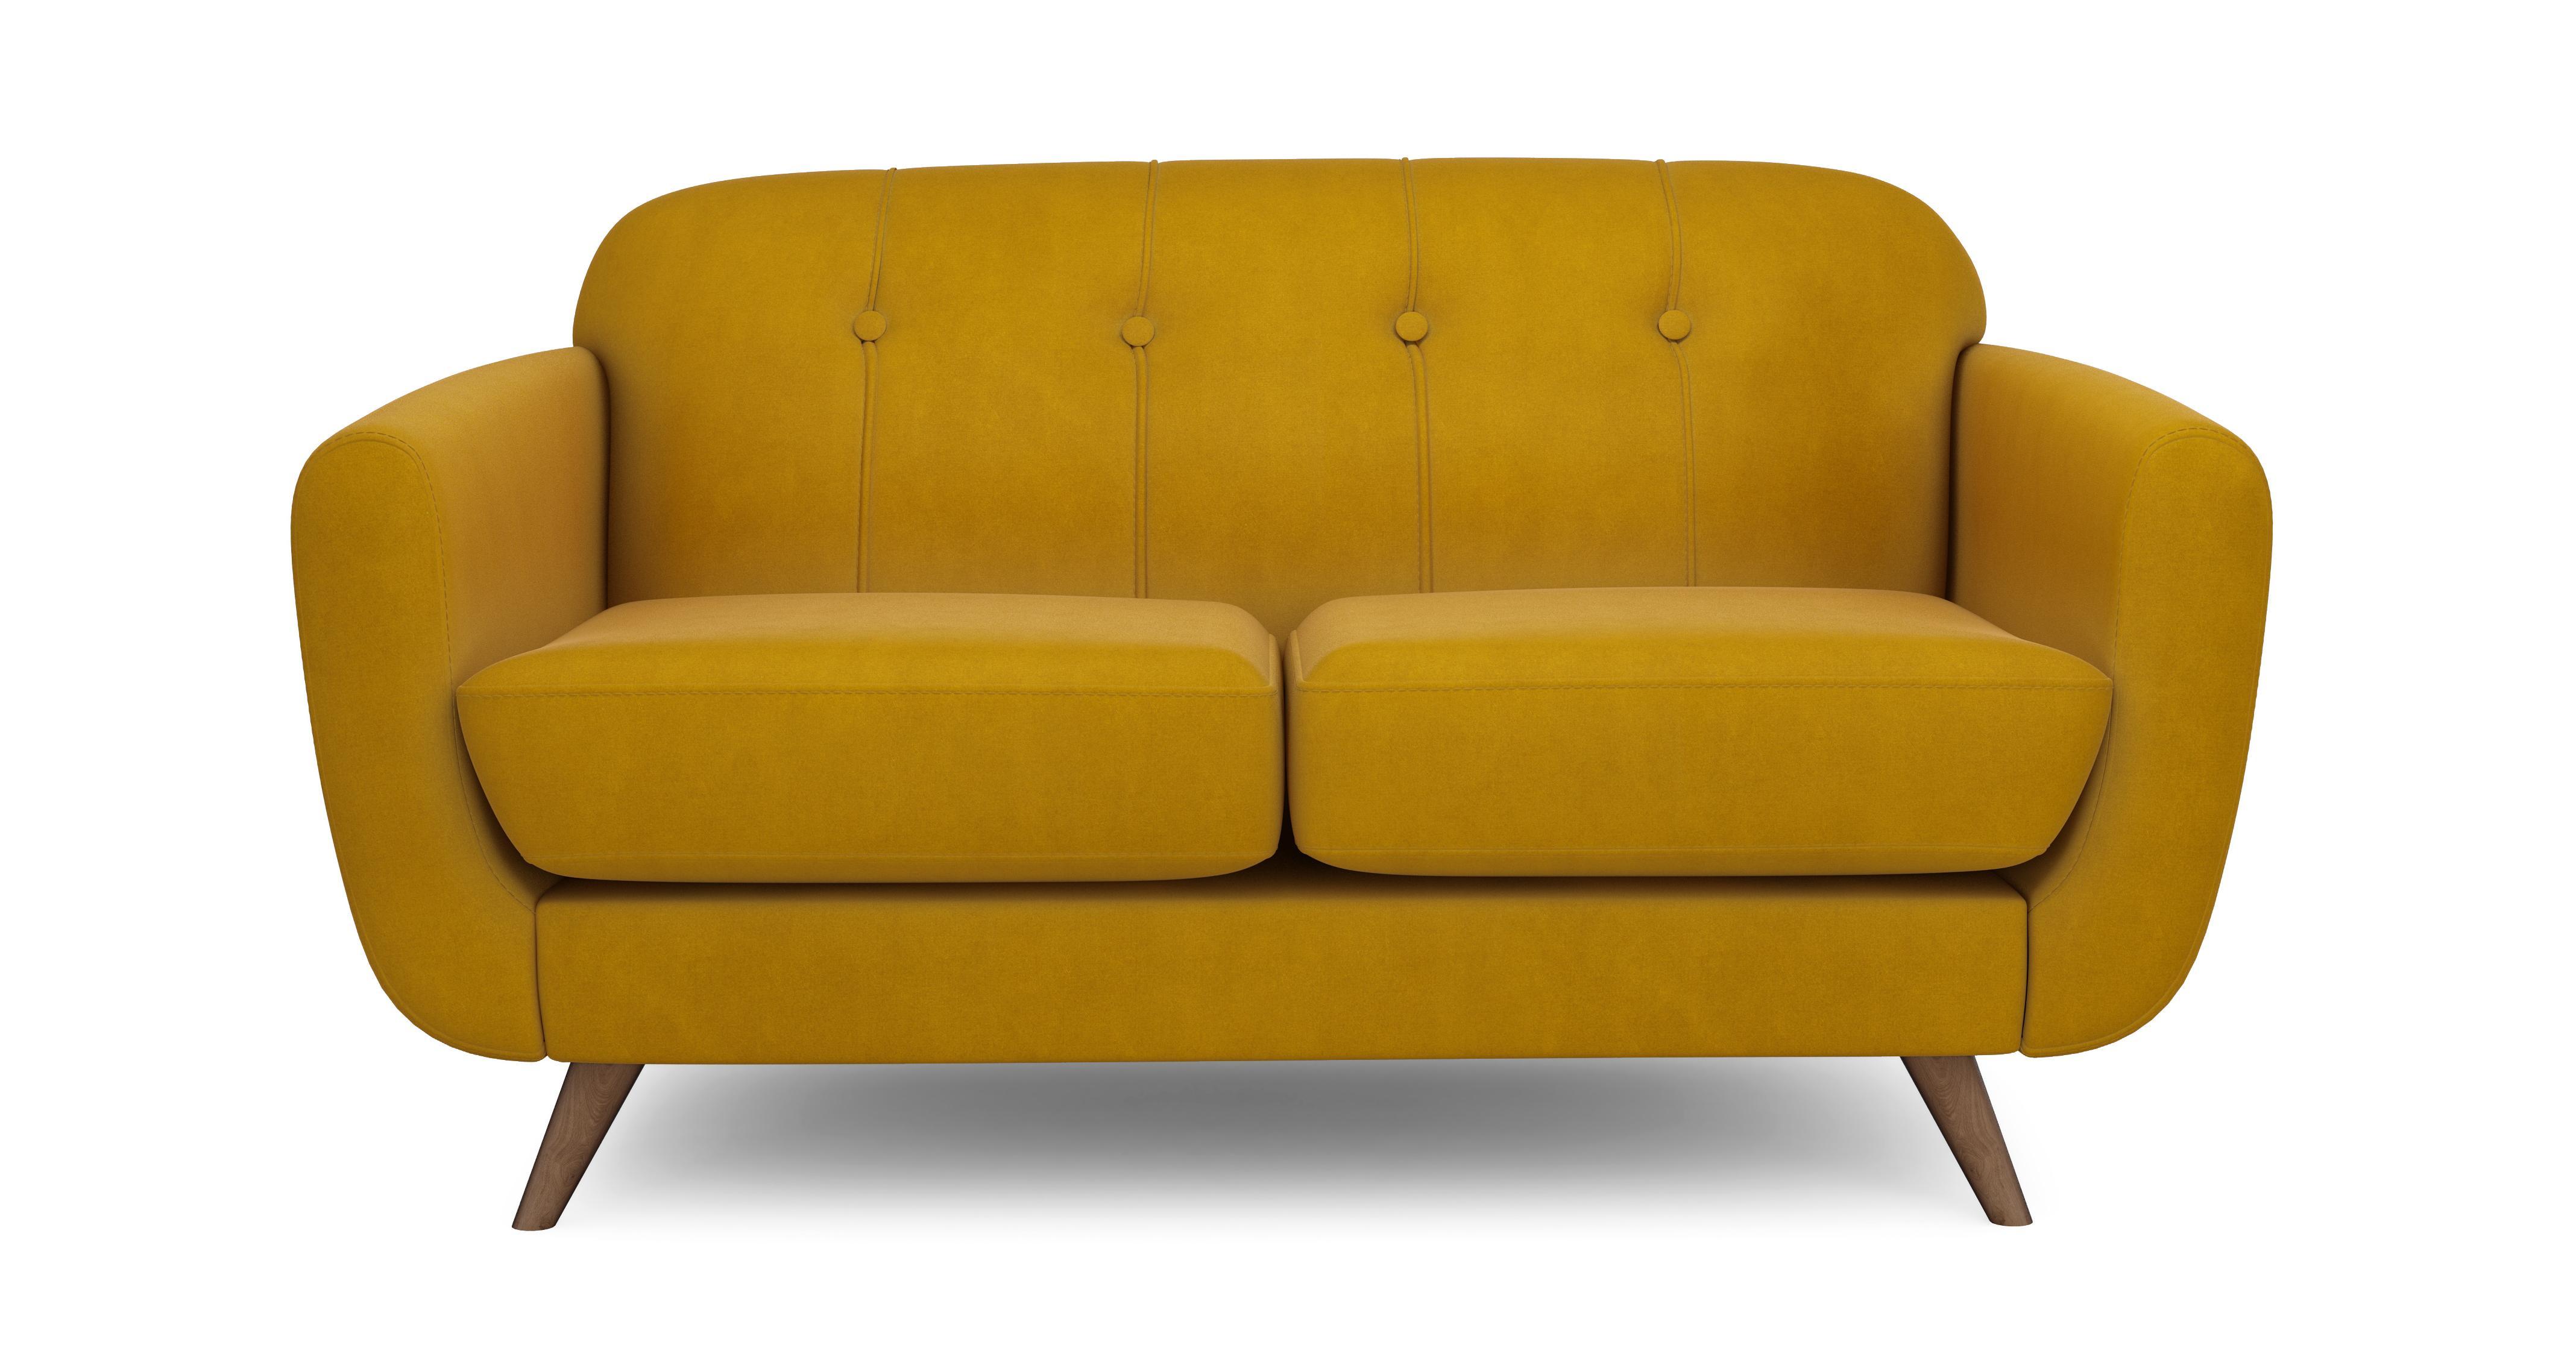 Attractive Laze Compact Sofa Velvet | DFS CR55